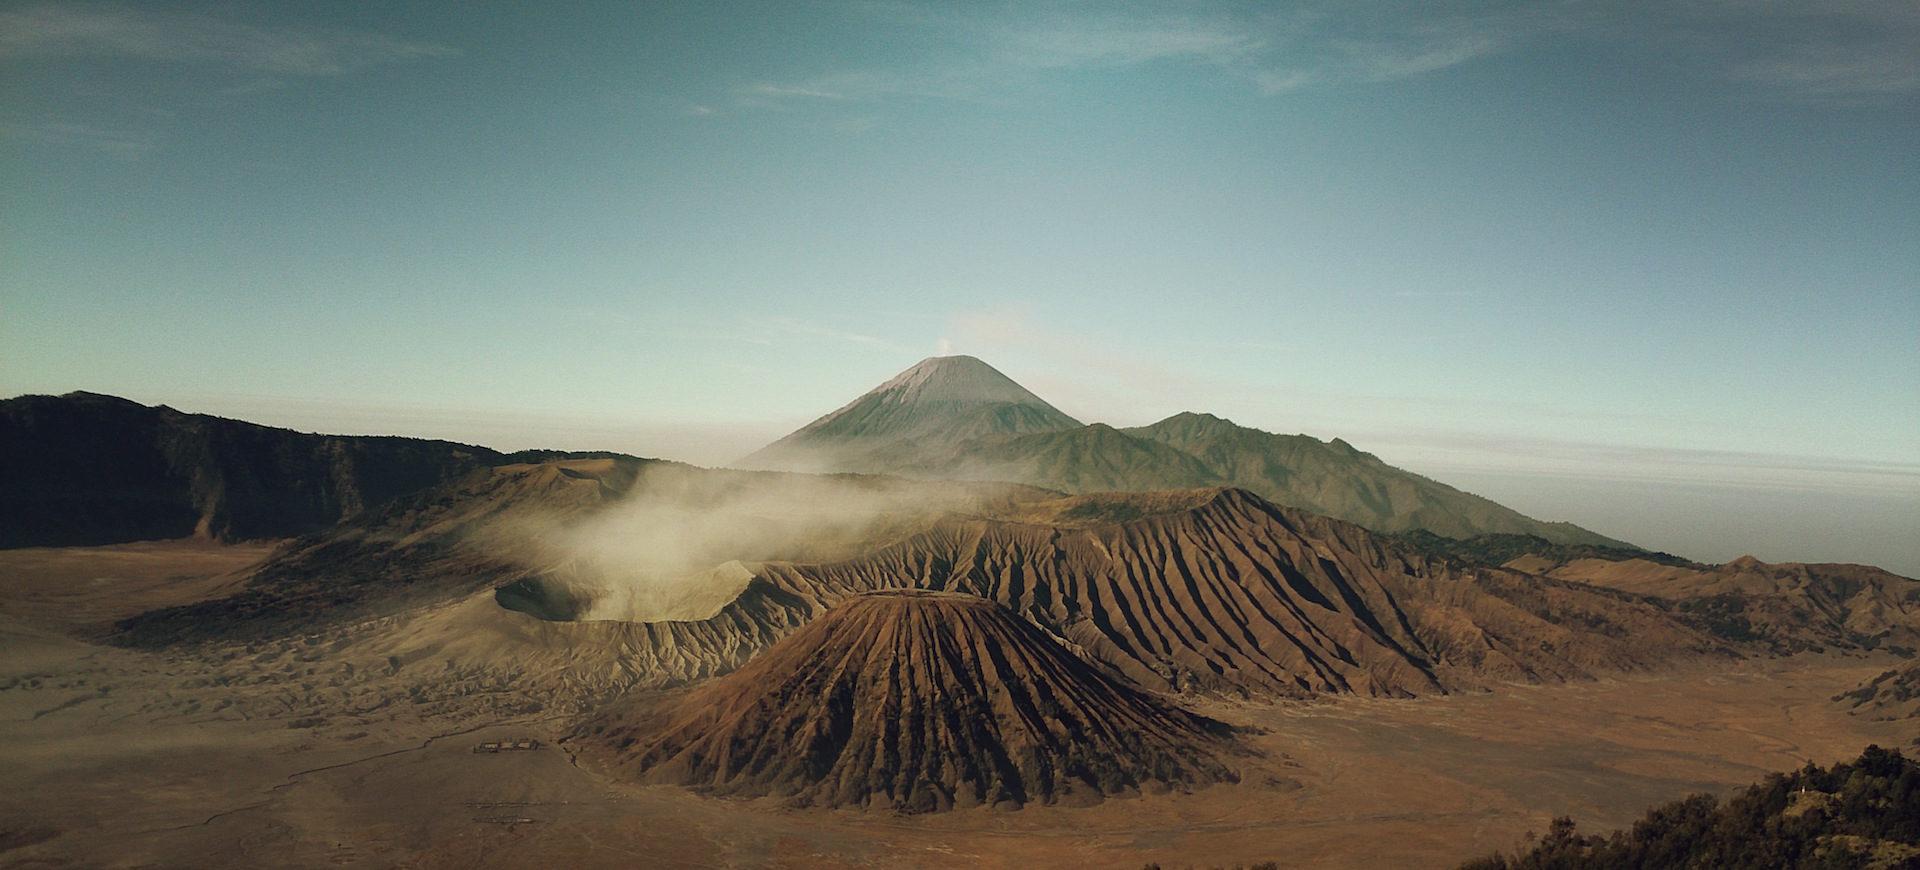 Montañas, Ηφαίστειο, αέρια, Ουρανός, σύννεφα - Wallpapers HD - Professor-falken.com